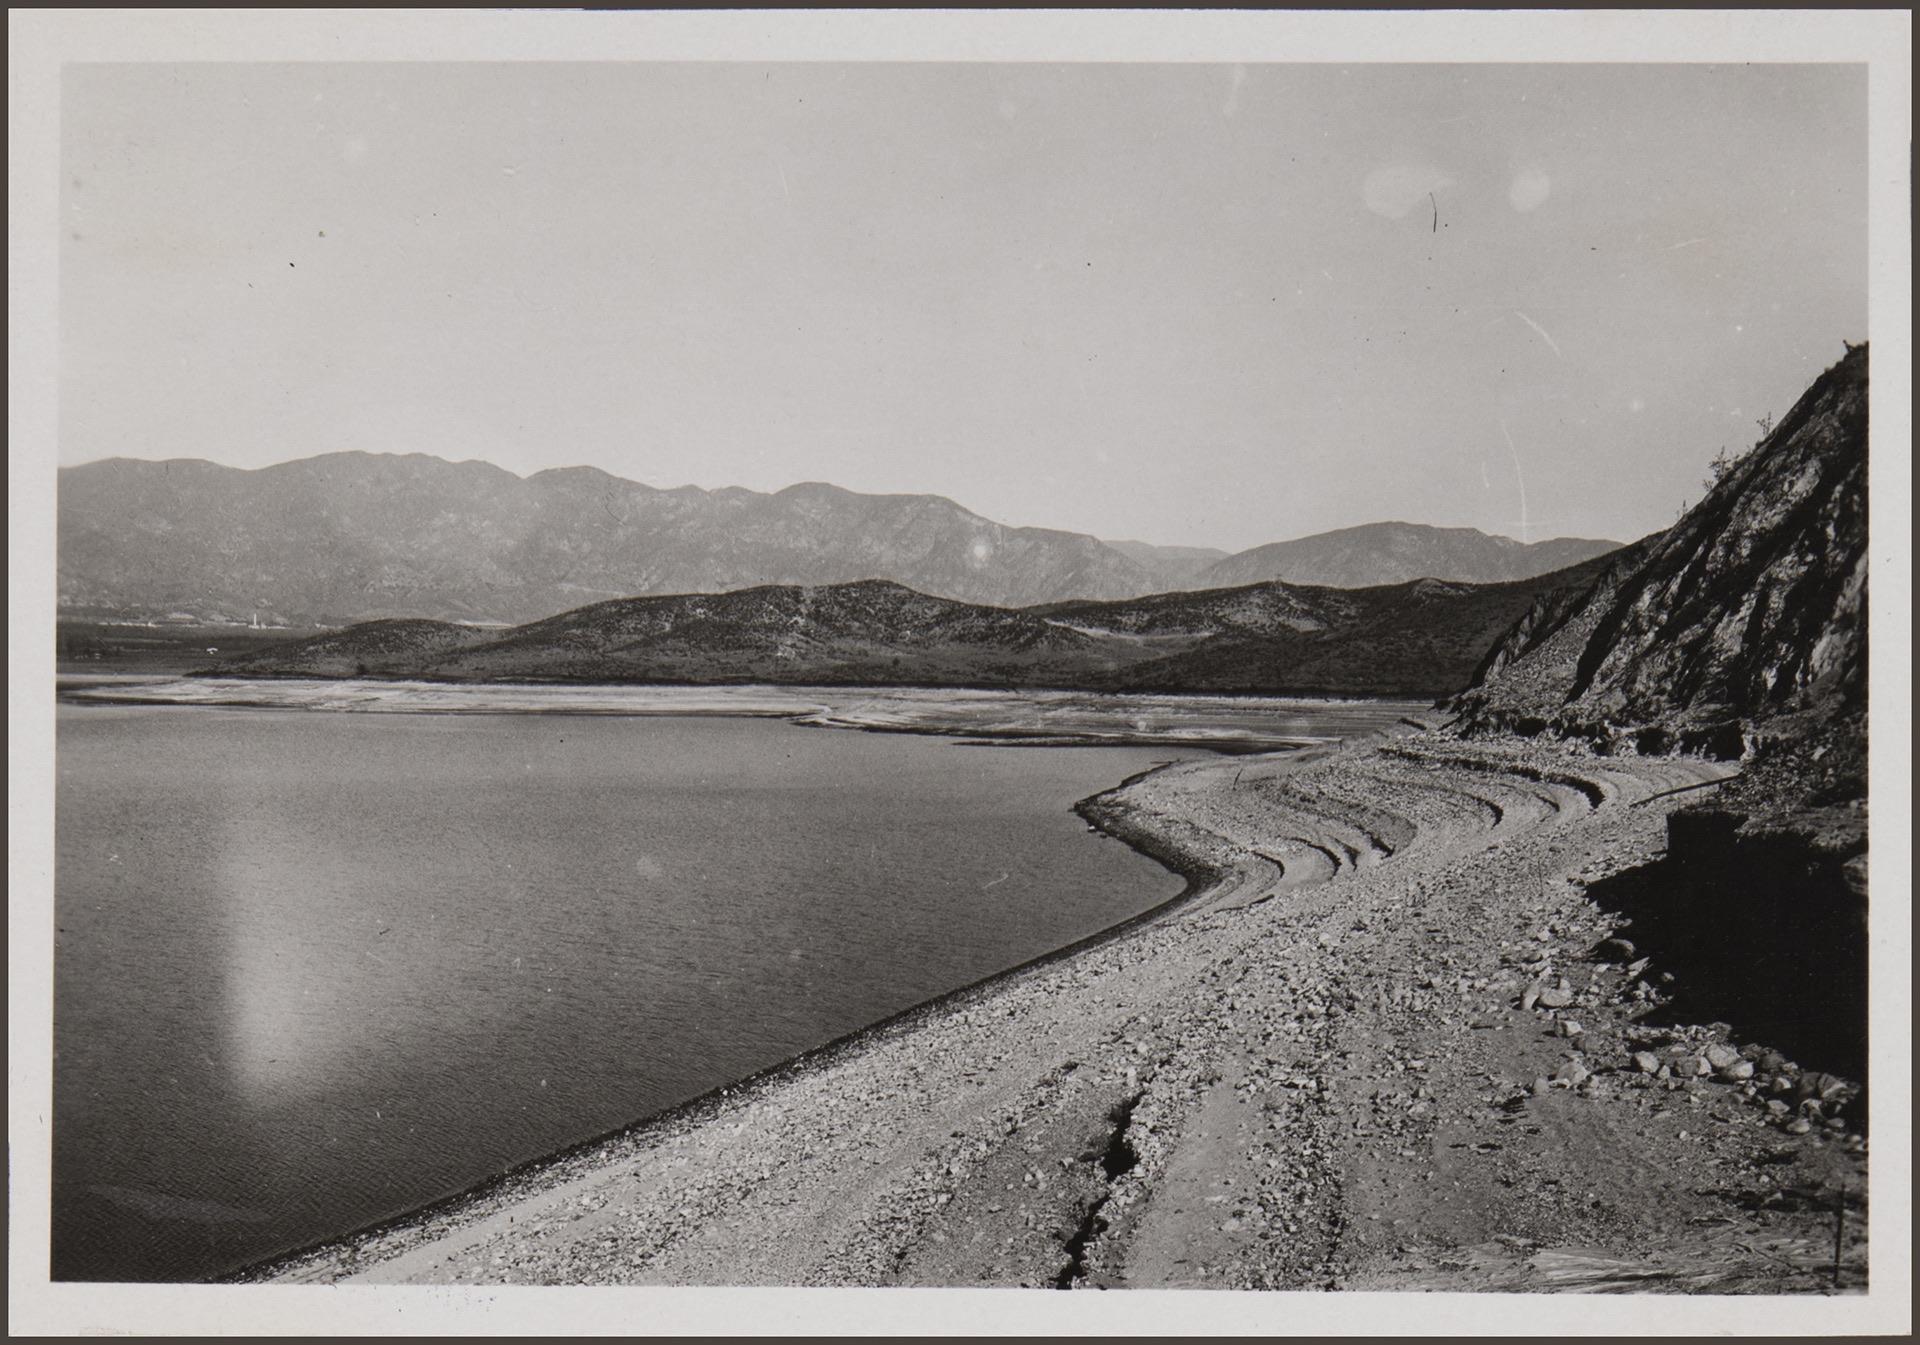 Reservoir near San Fernando, L.A. city water. Los Angeles: 1932-33 by Anton Wagner, PC 17, California Historical Society.